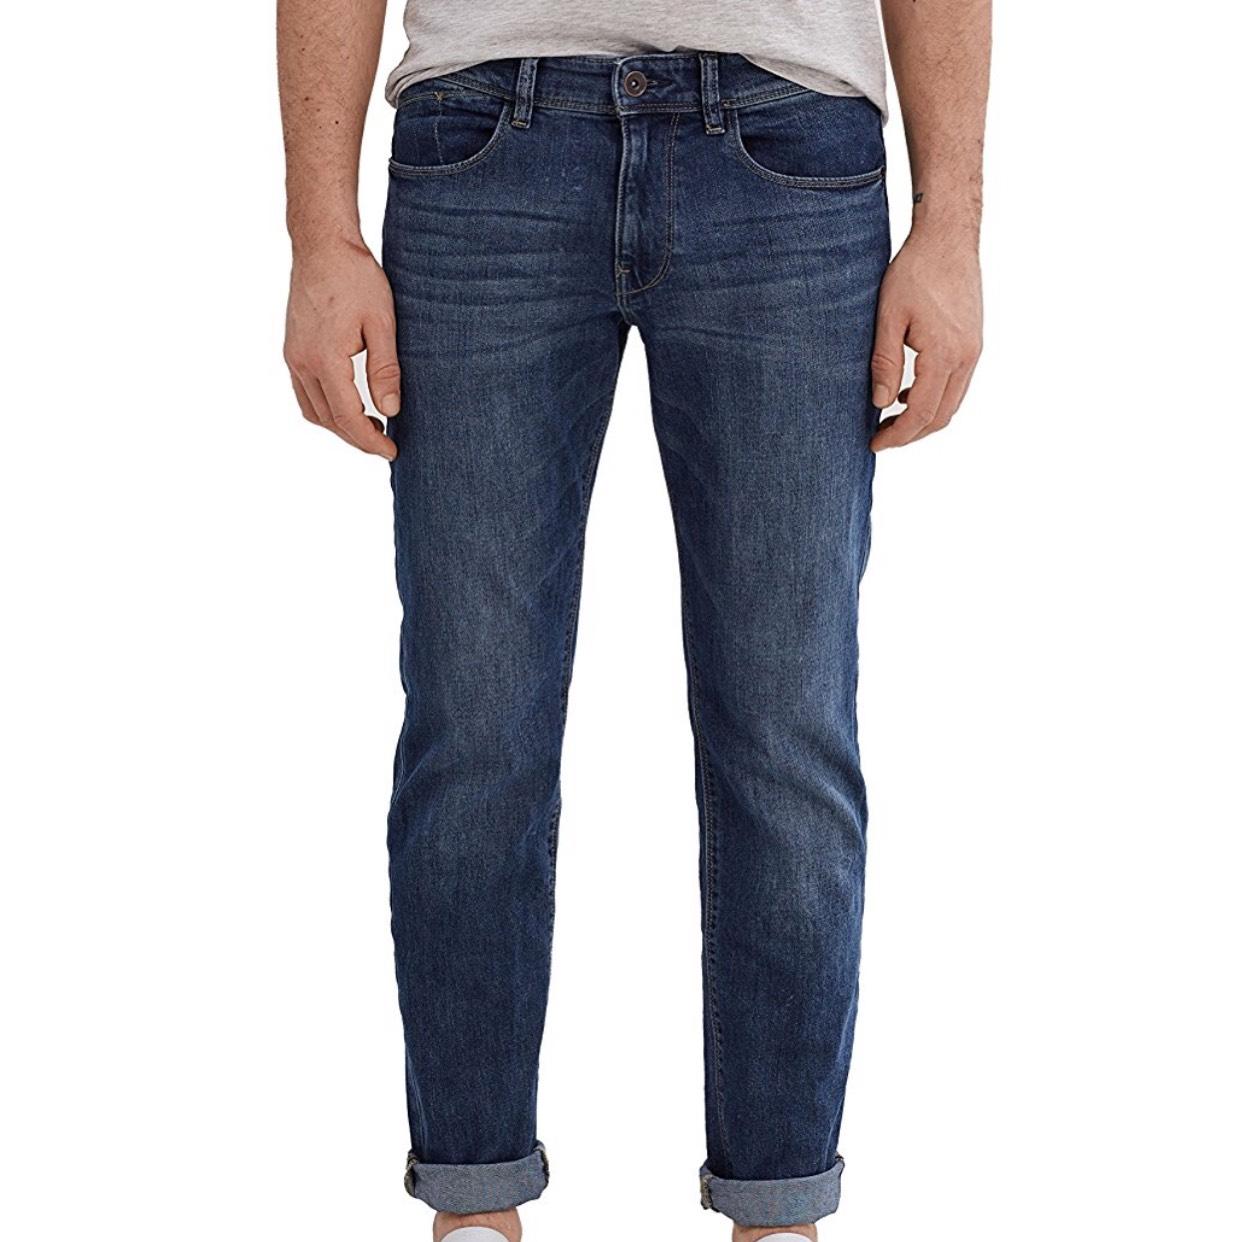 esprit herren jeans casual look viele gr en amazon. Black Bedroom Furniture Sets. Home Design Ideas